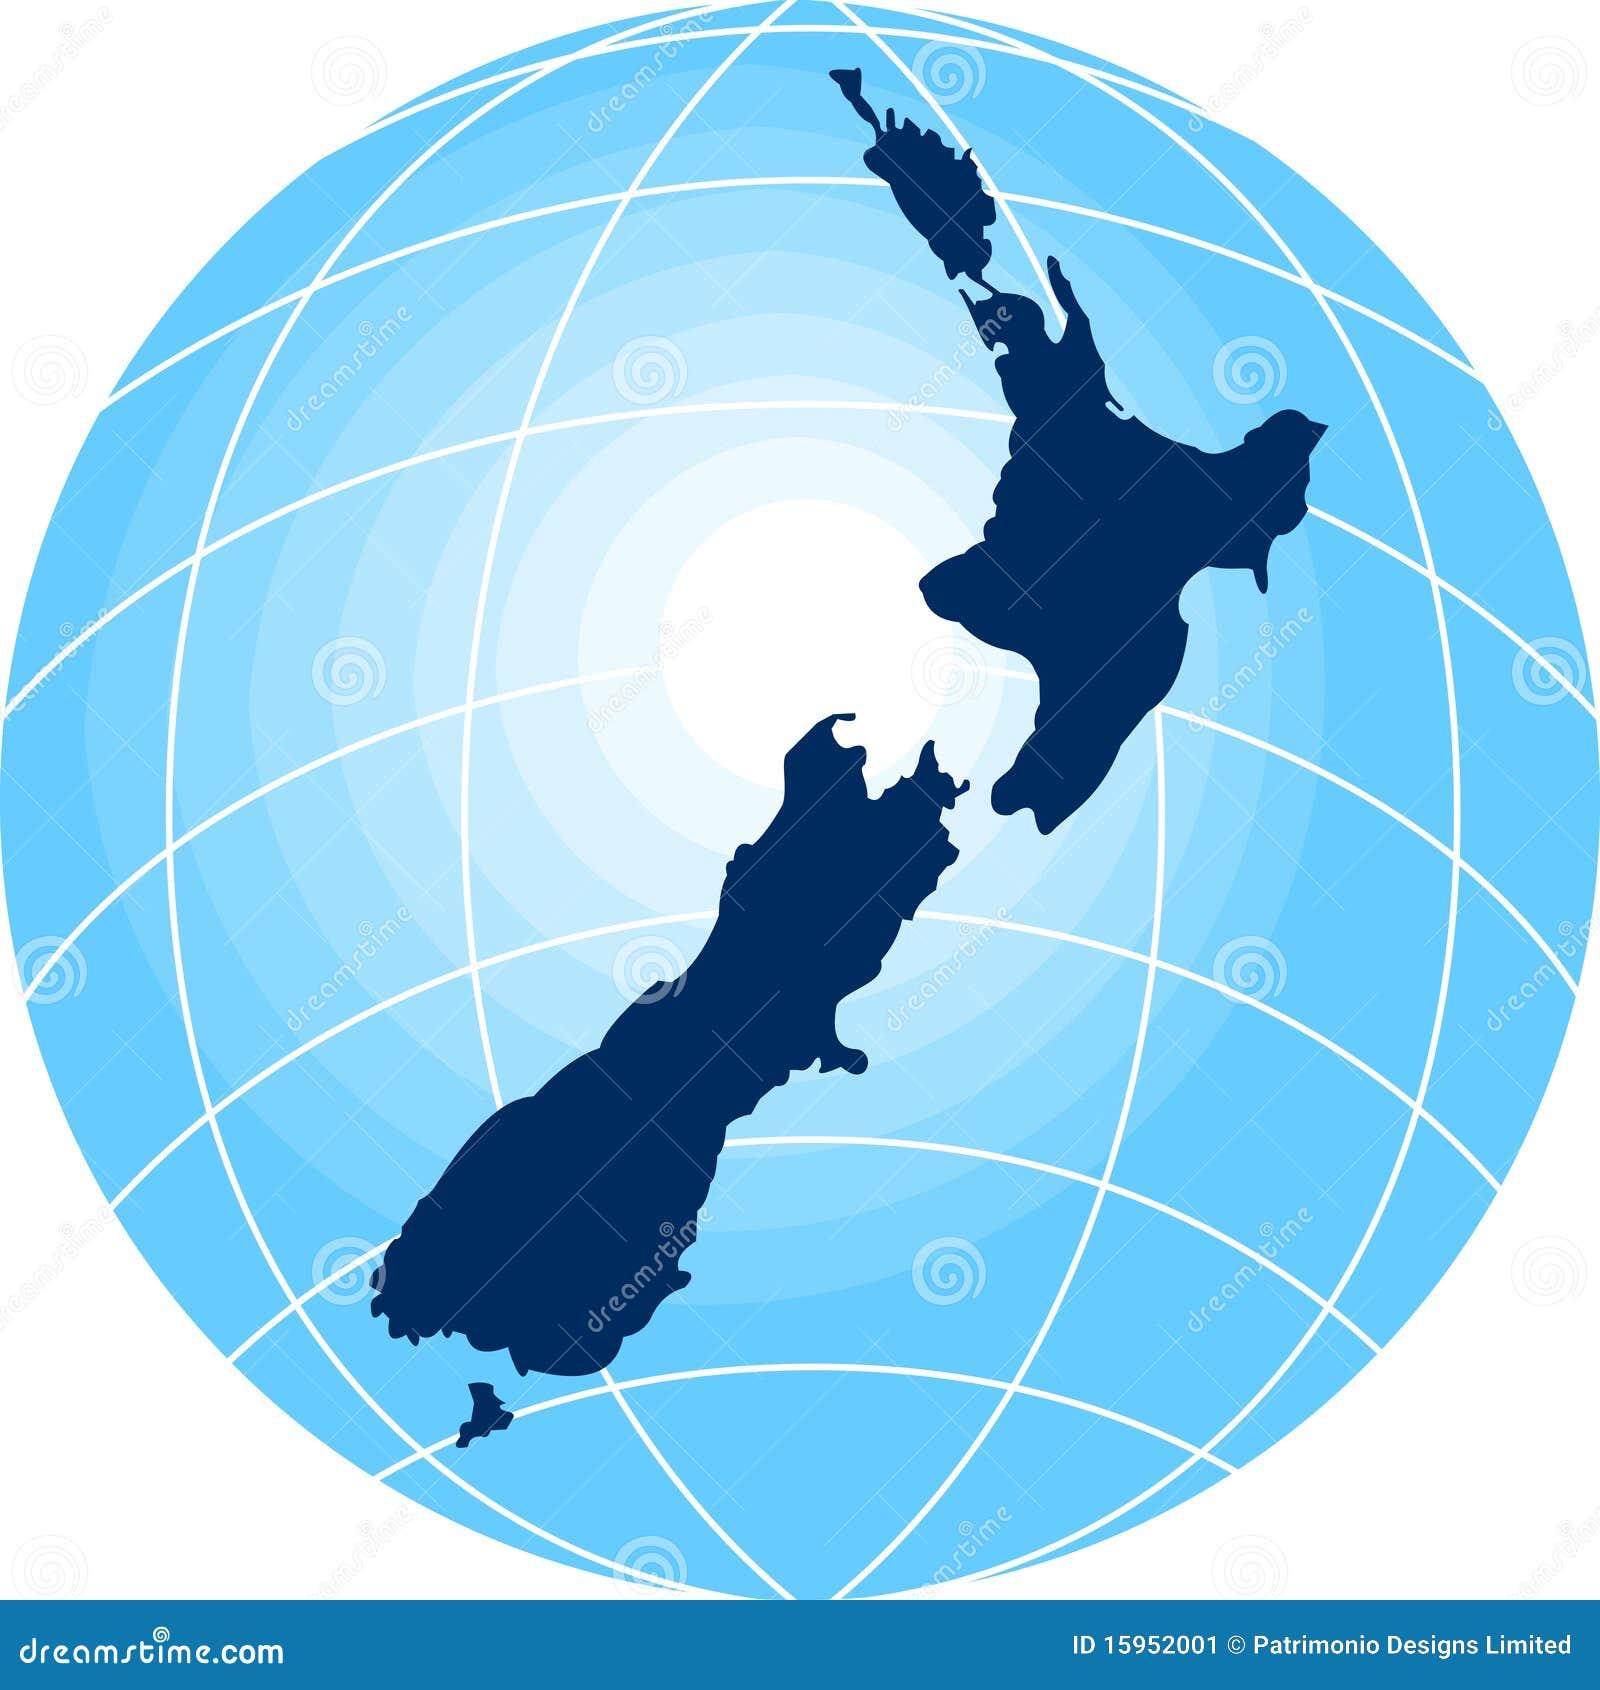 Carte Nouvelle Zelande Dessin.Carte De La Nouvelle Zelande Illustration Stock